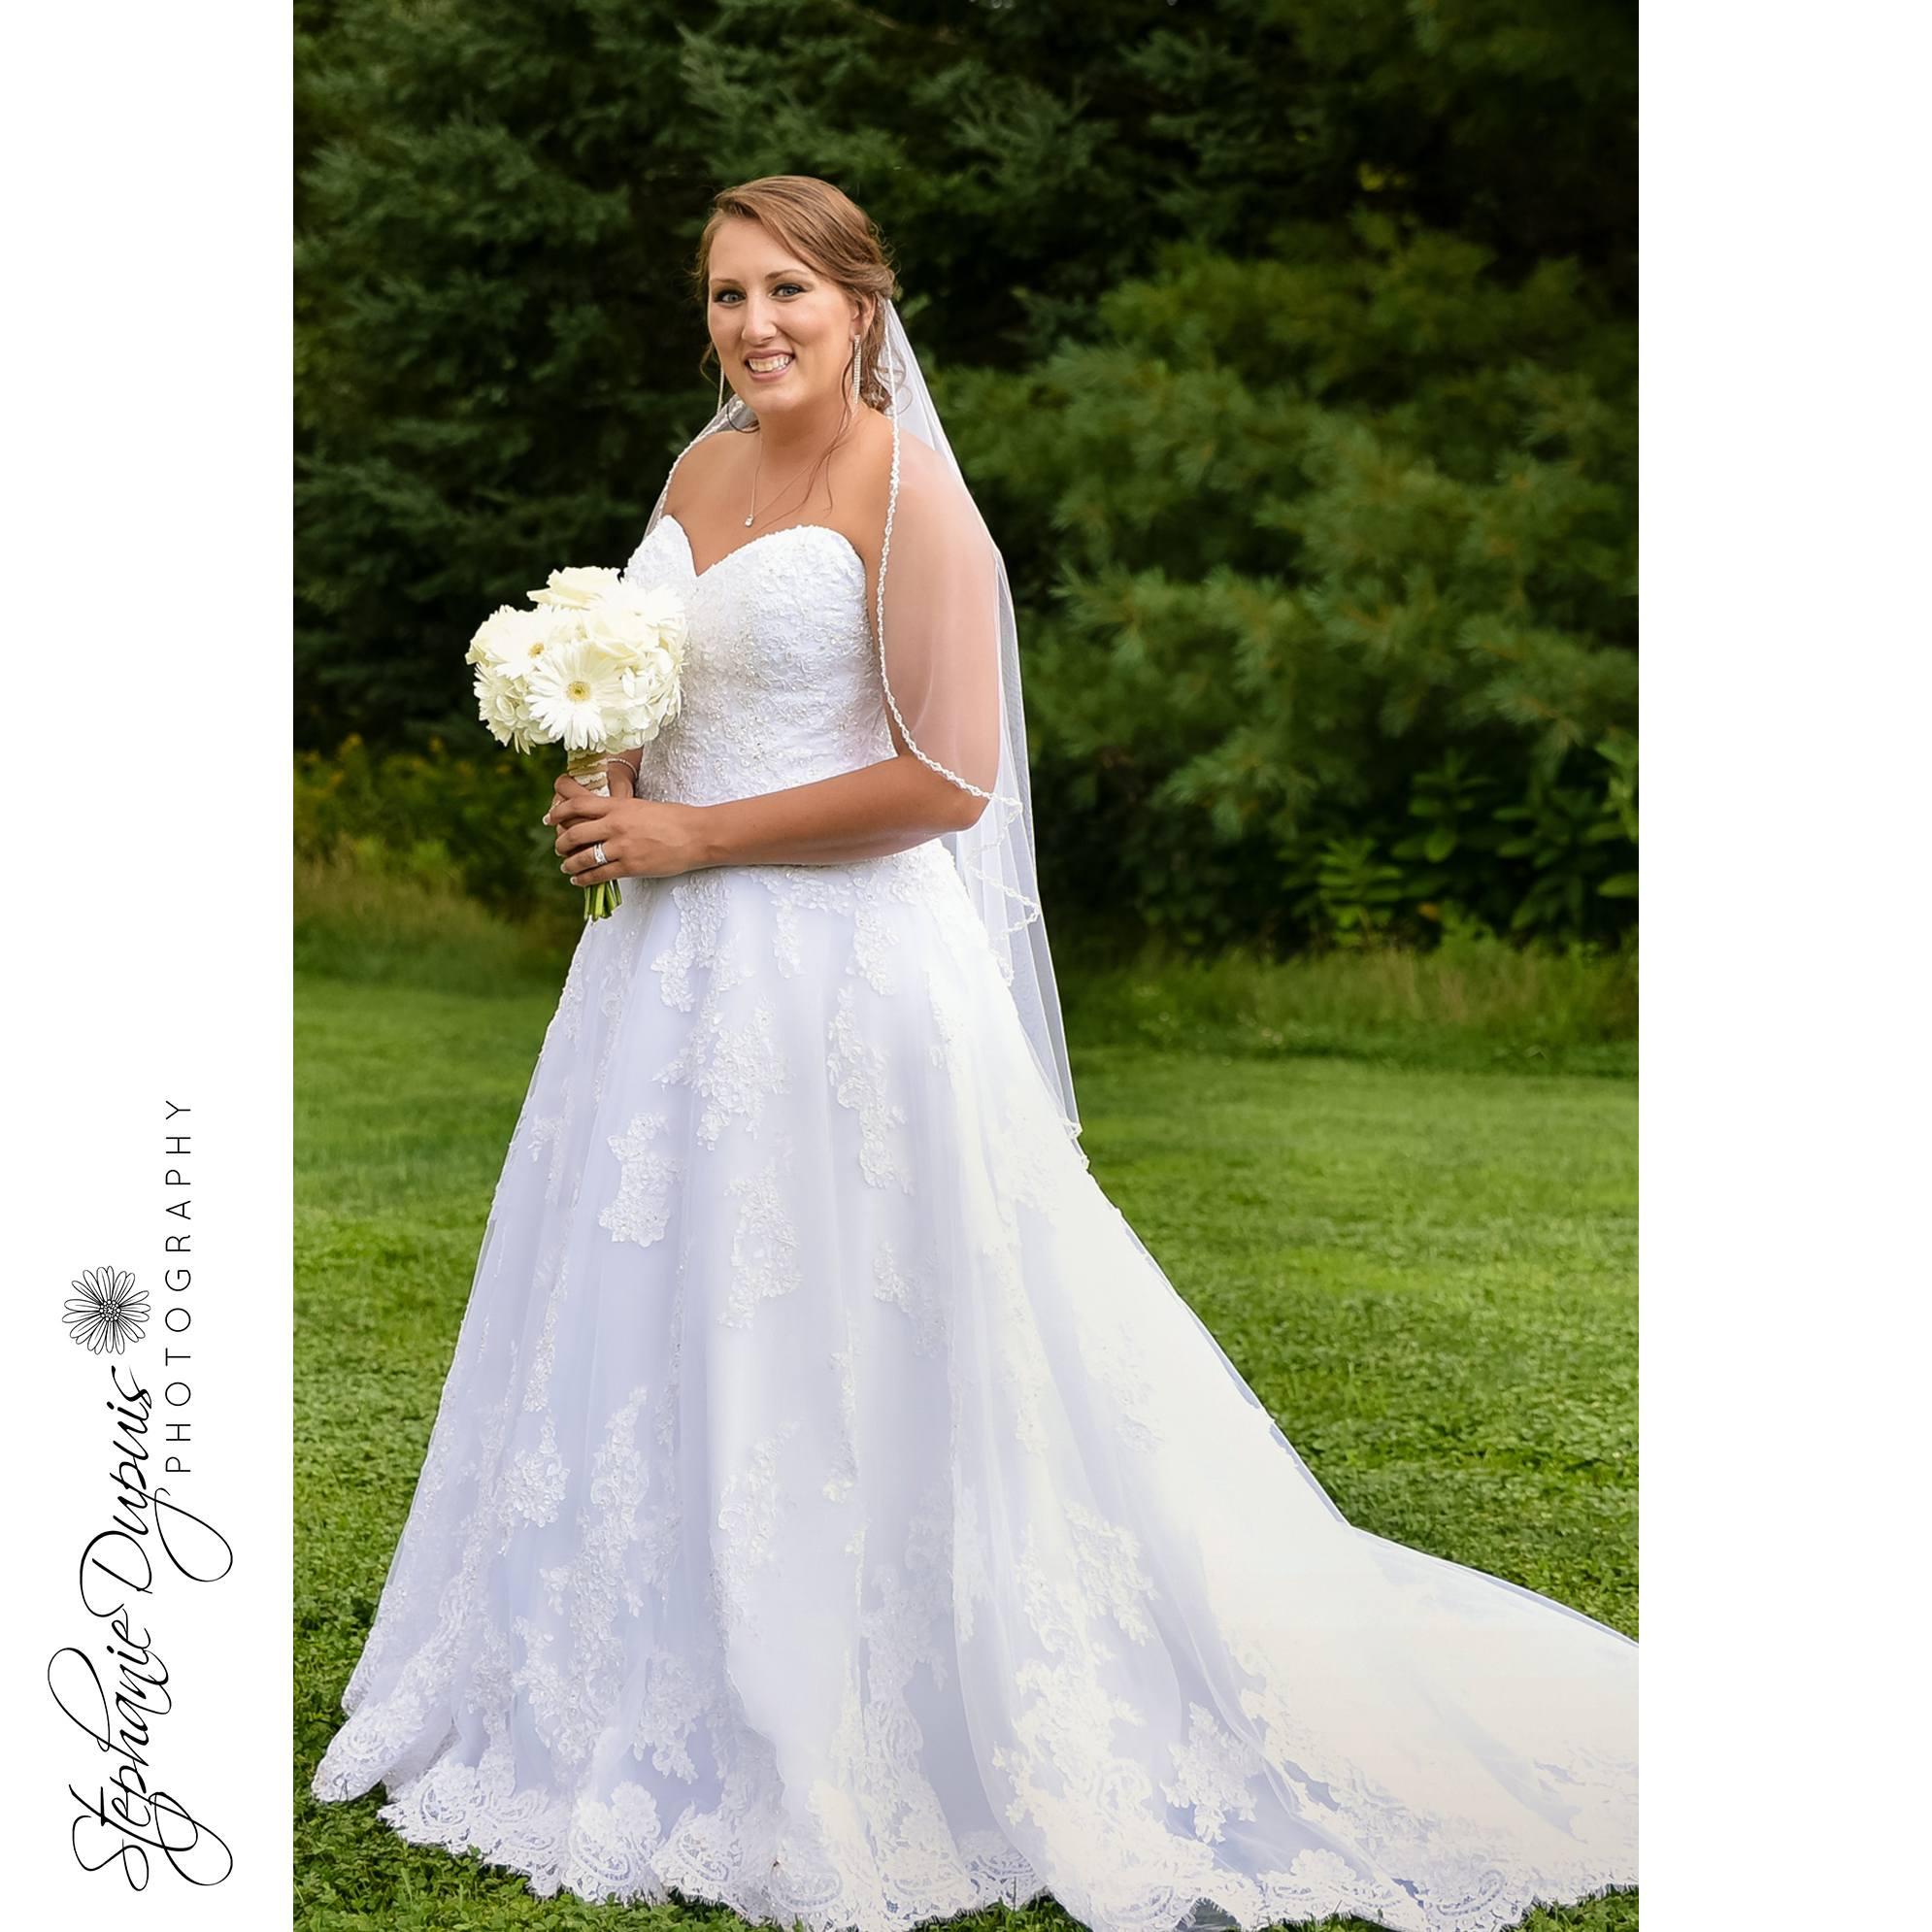 Lancaster Wedding Photographer 01 4 - Portfolio: Nason Wedding